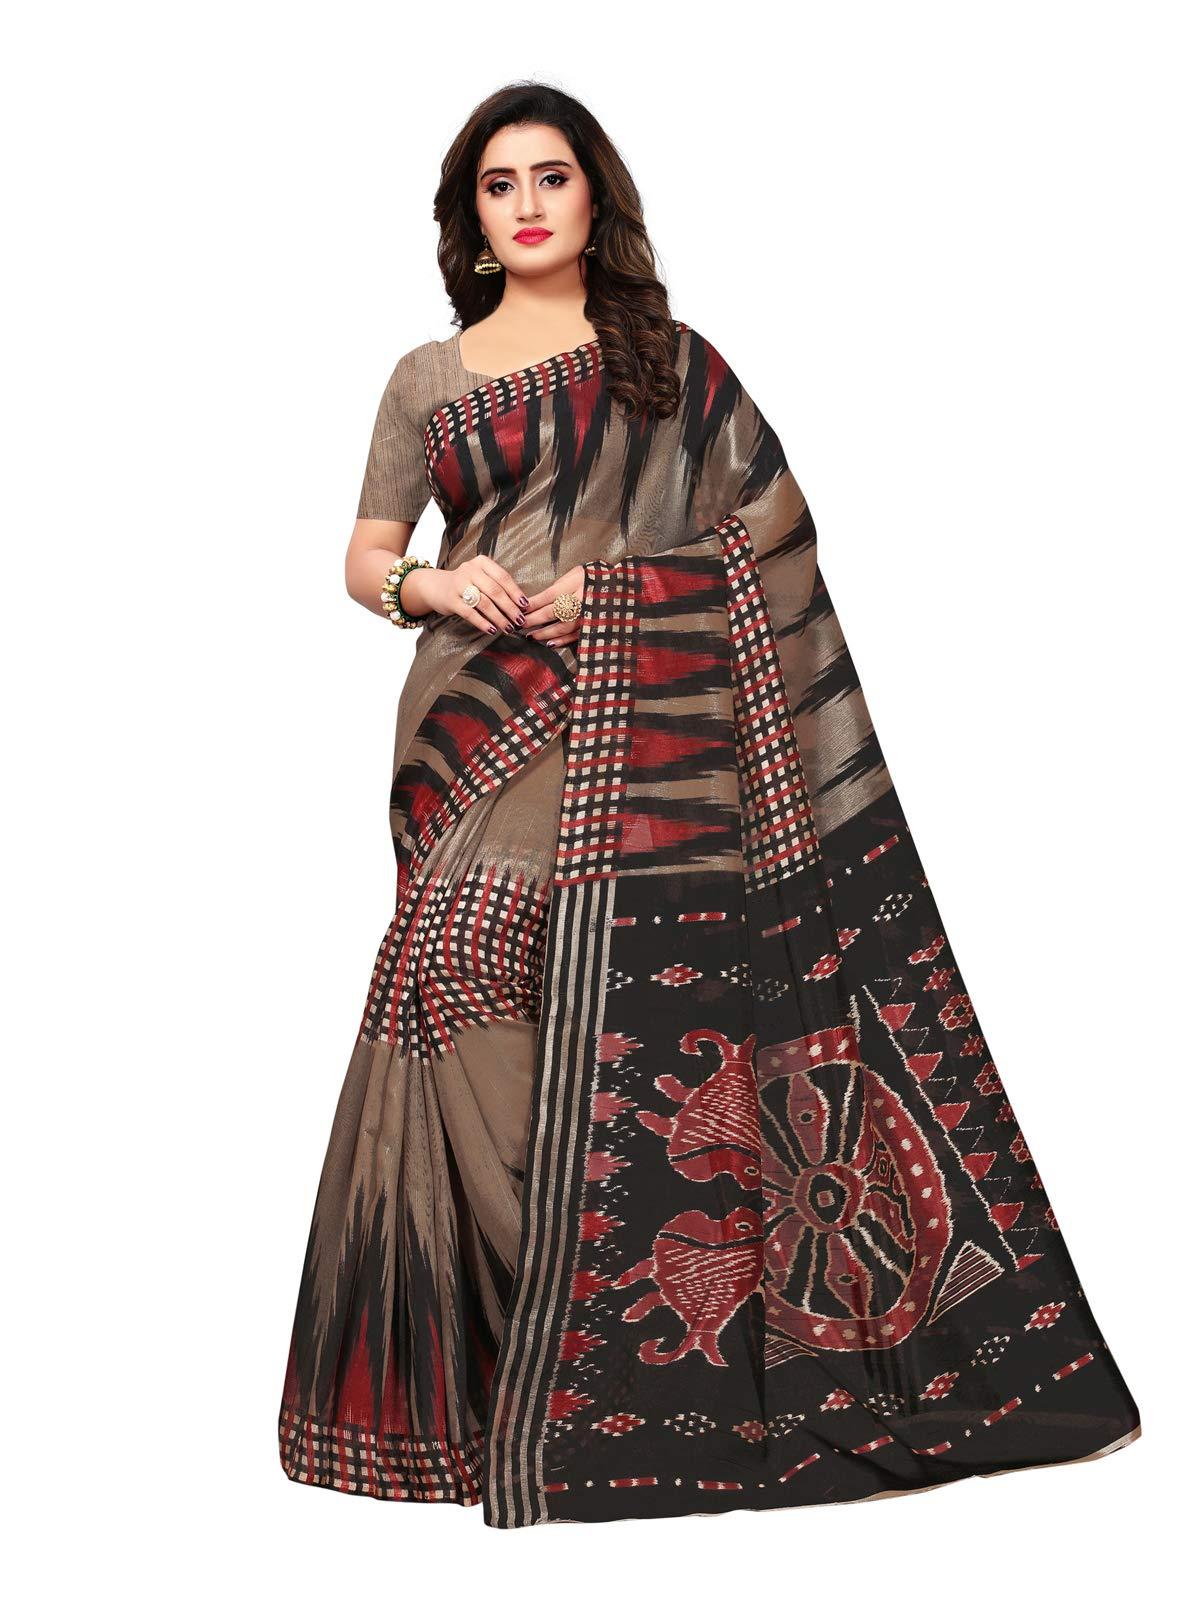 Kanchnar Women's Bhagalpuri Silk Printed Saree with Blouse